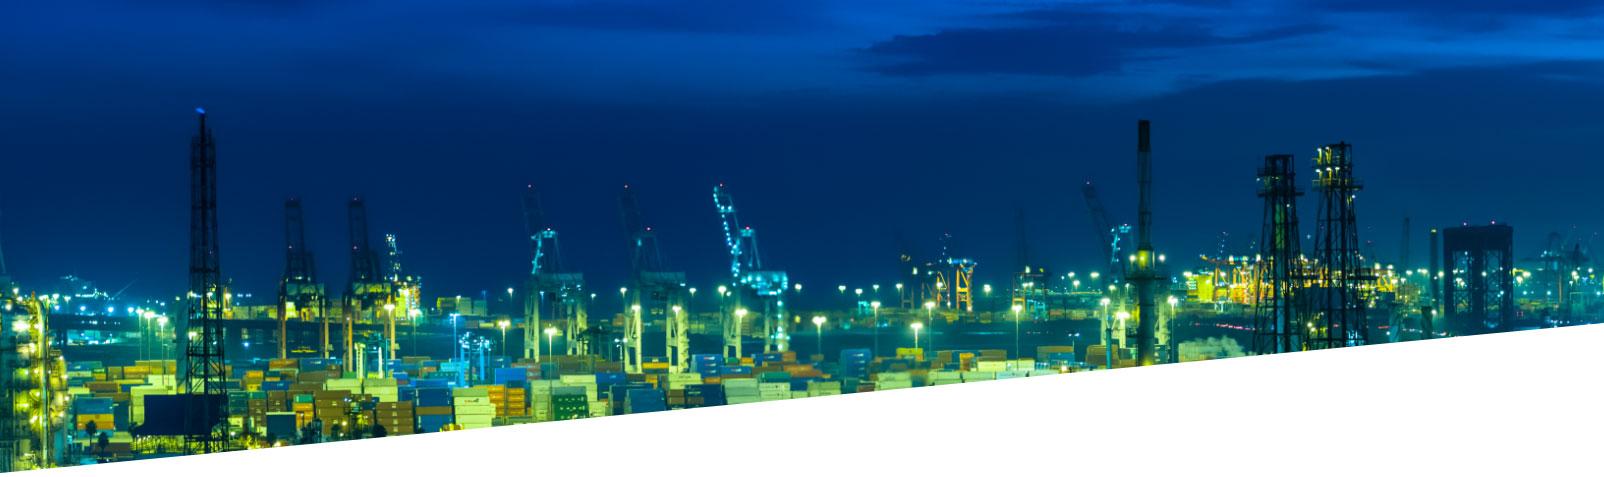 energy processing facility at night